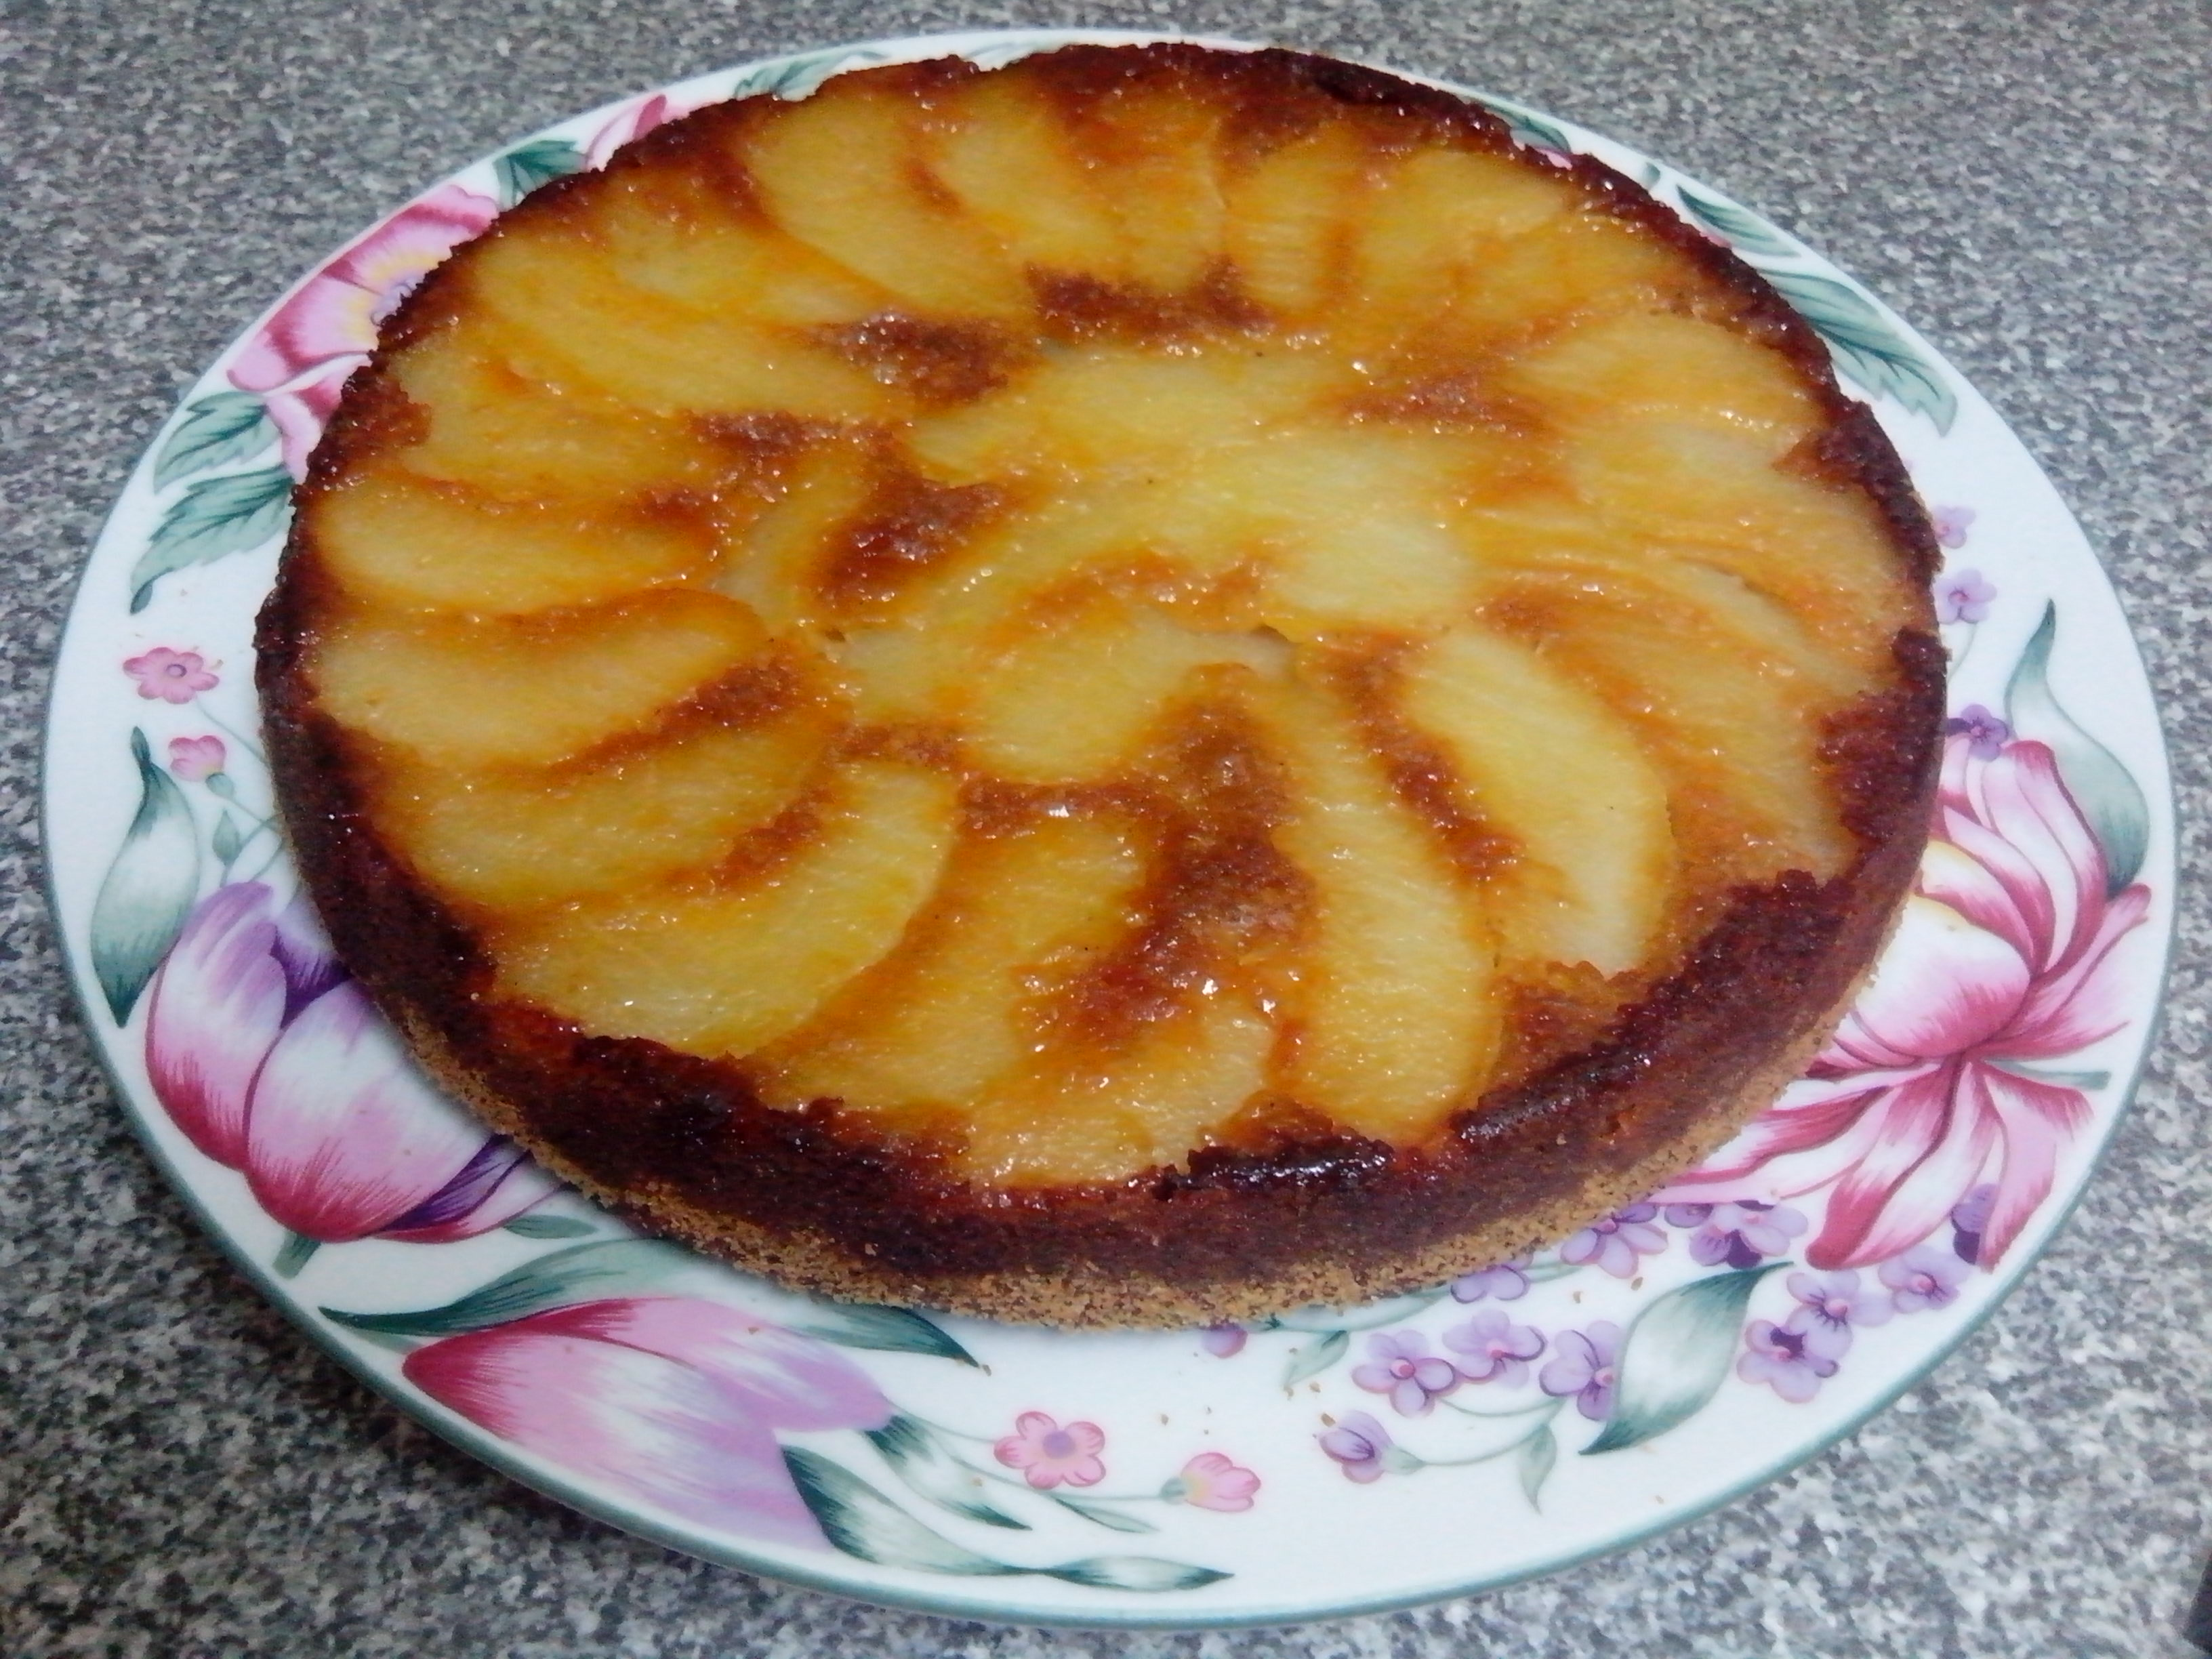 Spiced Pear Upside Down Cake – The Grantham Gardener